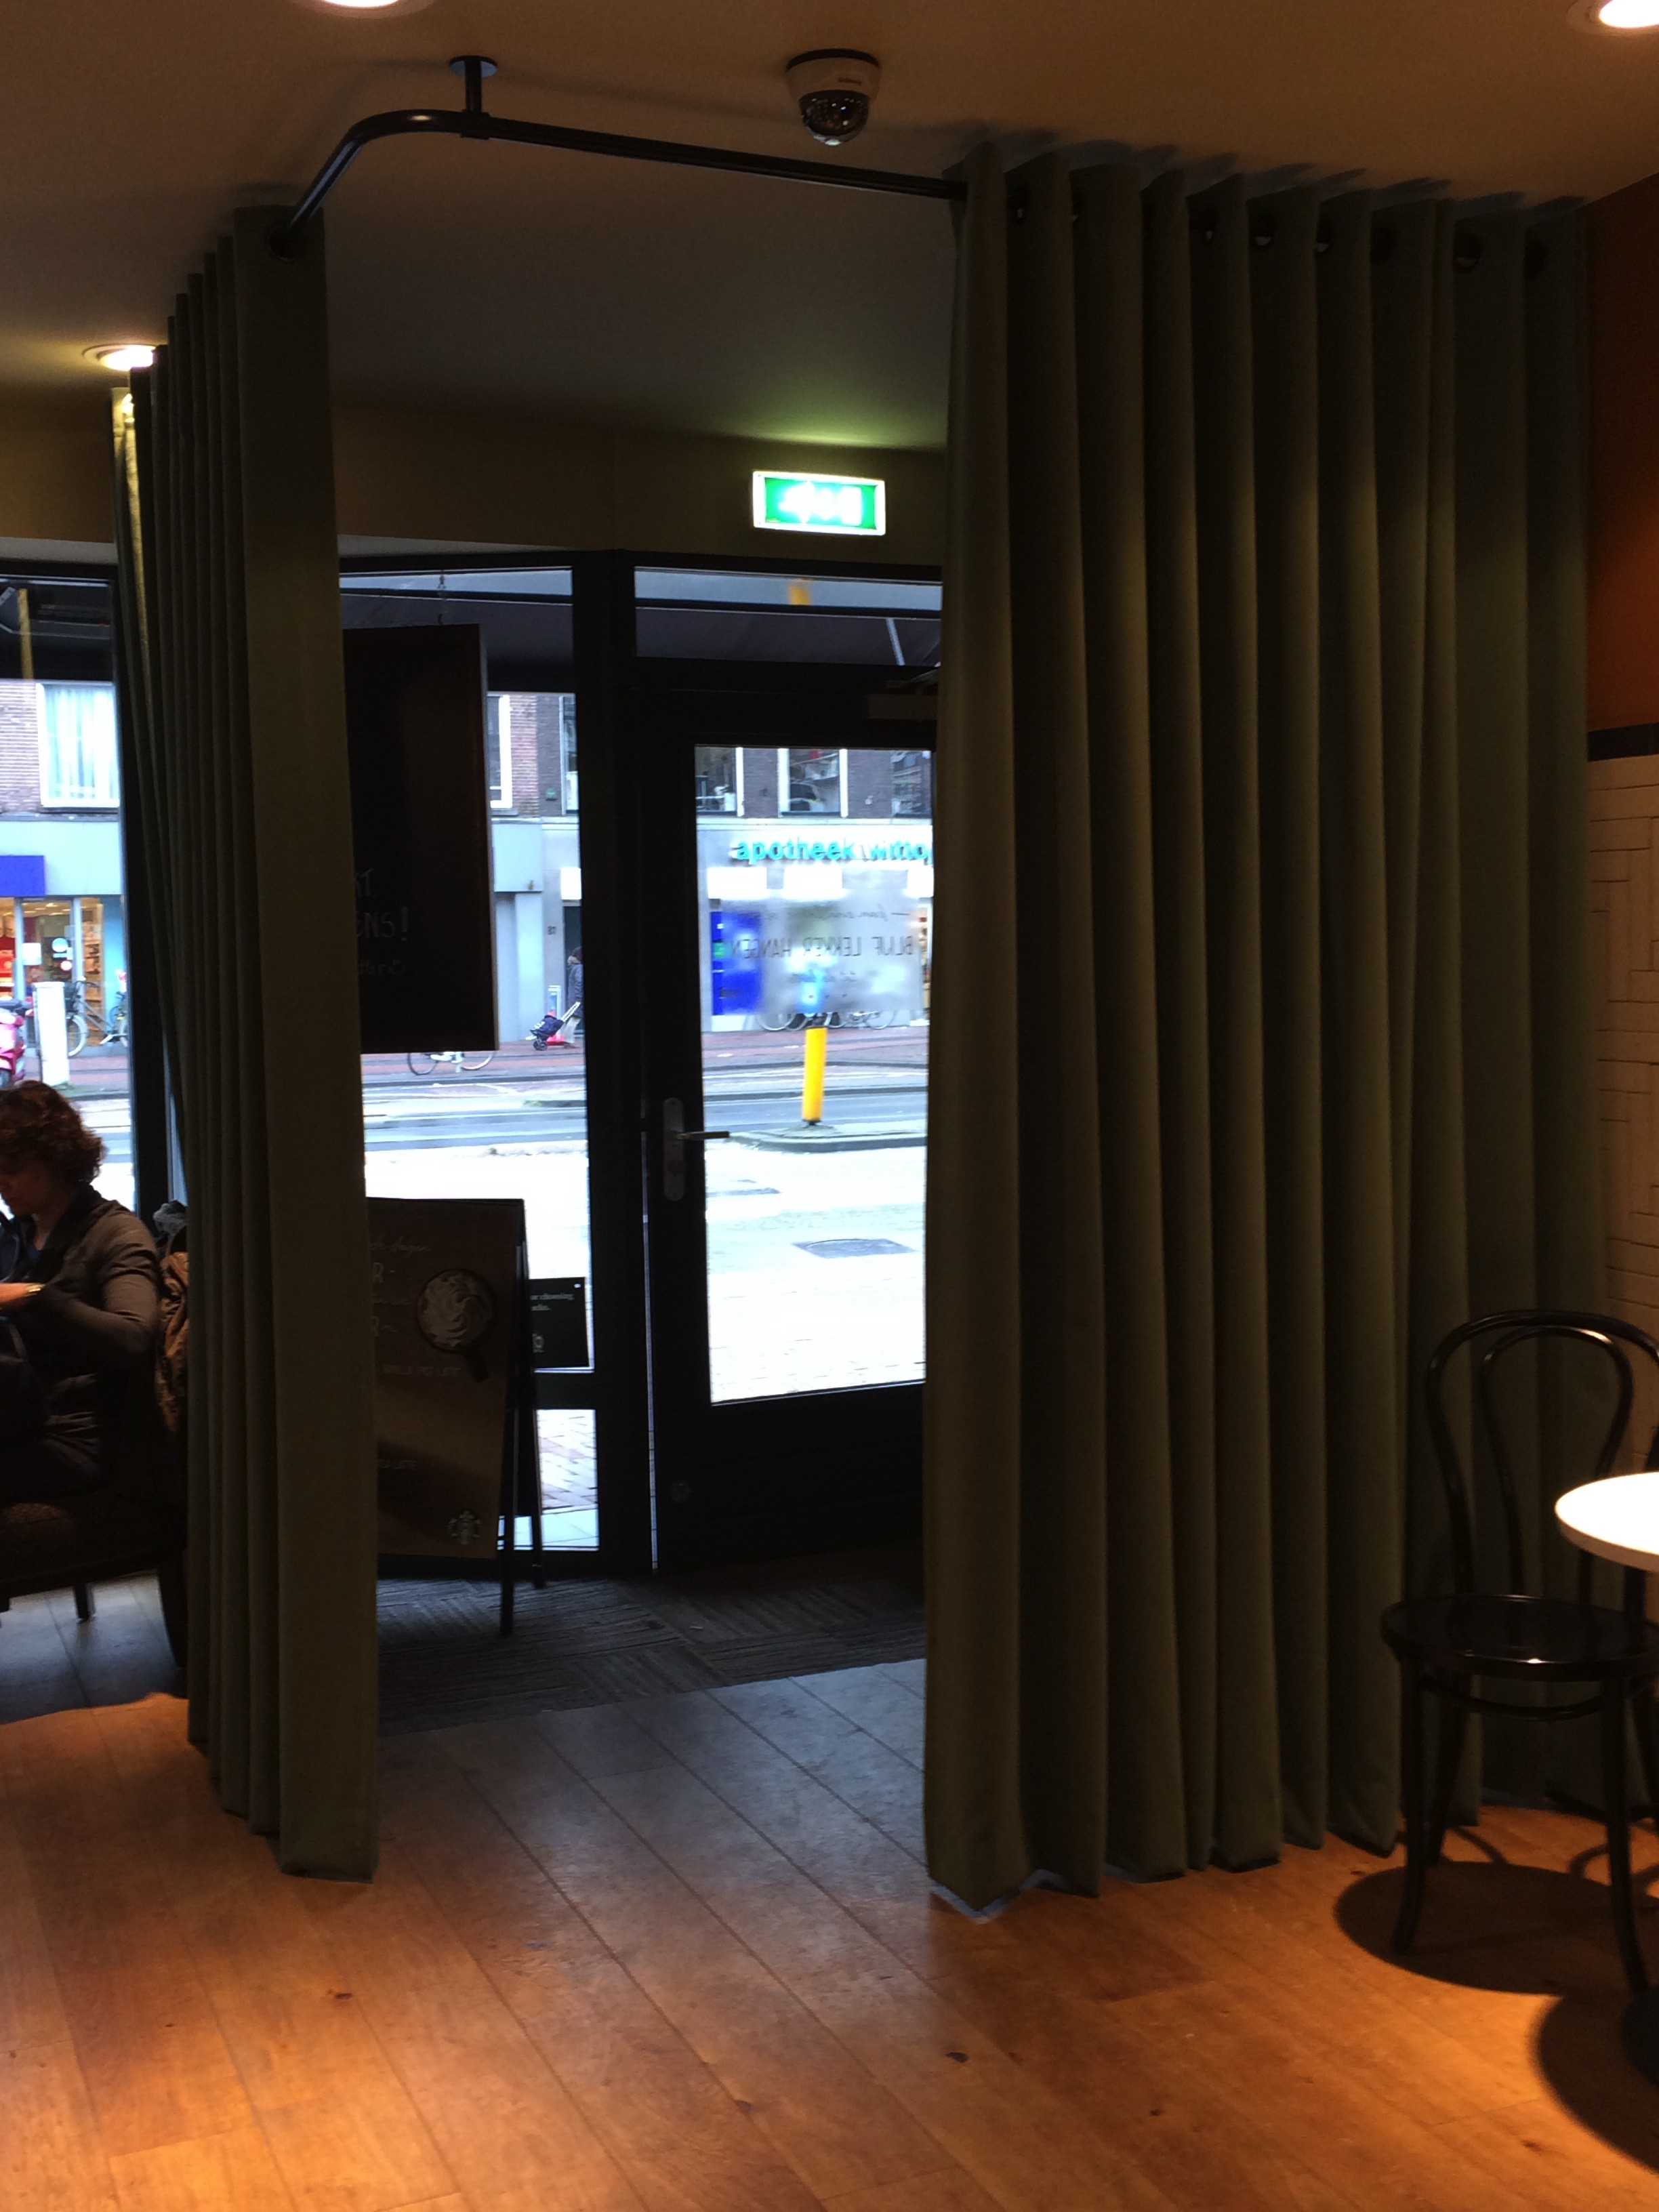 Tochtgordijn Starbucks Overtoom Amsterdam